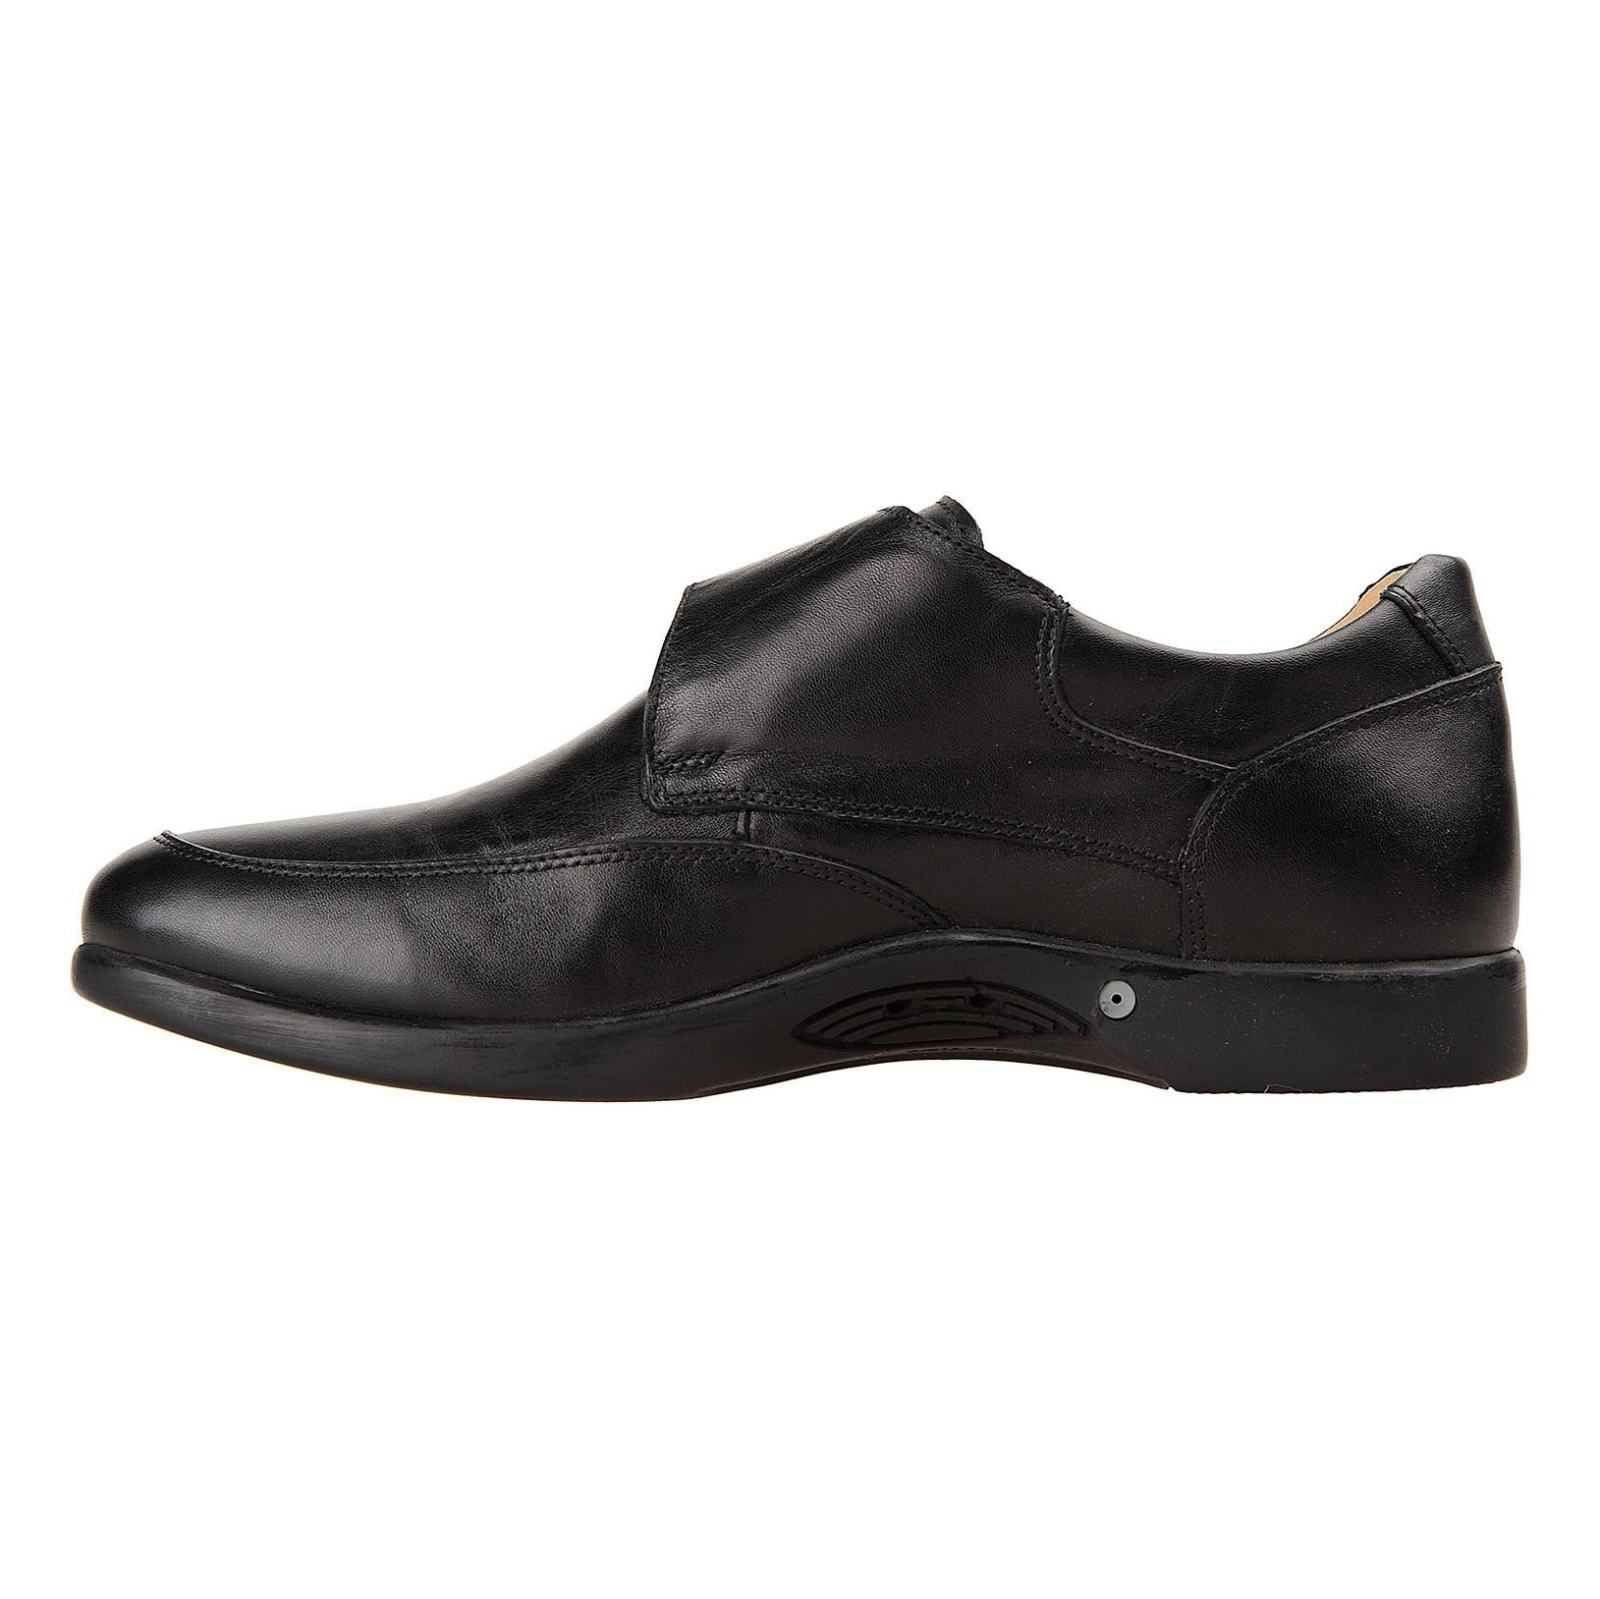 کفش اداری چرم مردانه - شهر چرم - مشکي - 3